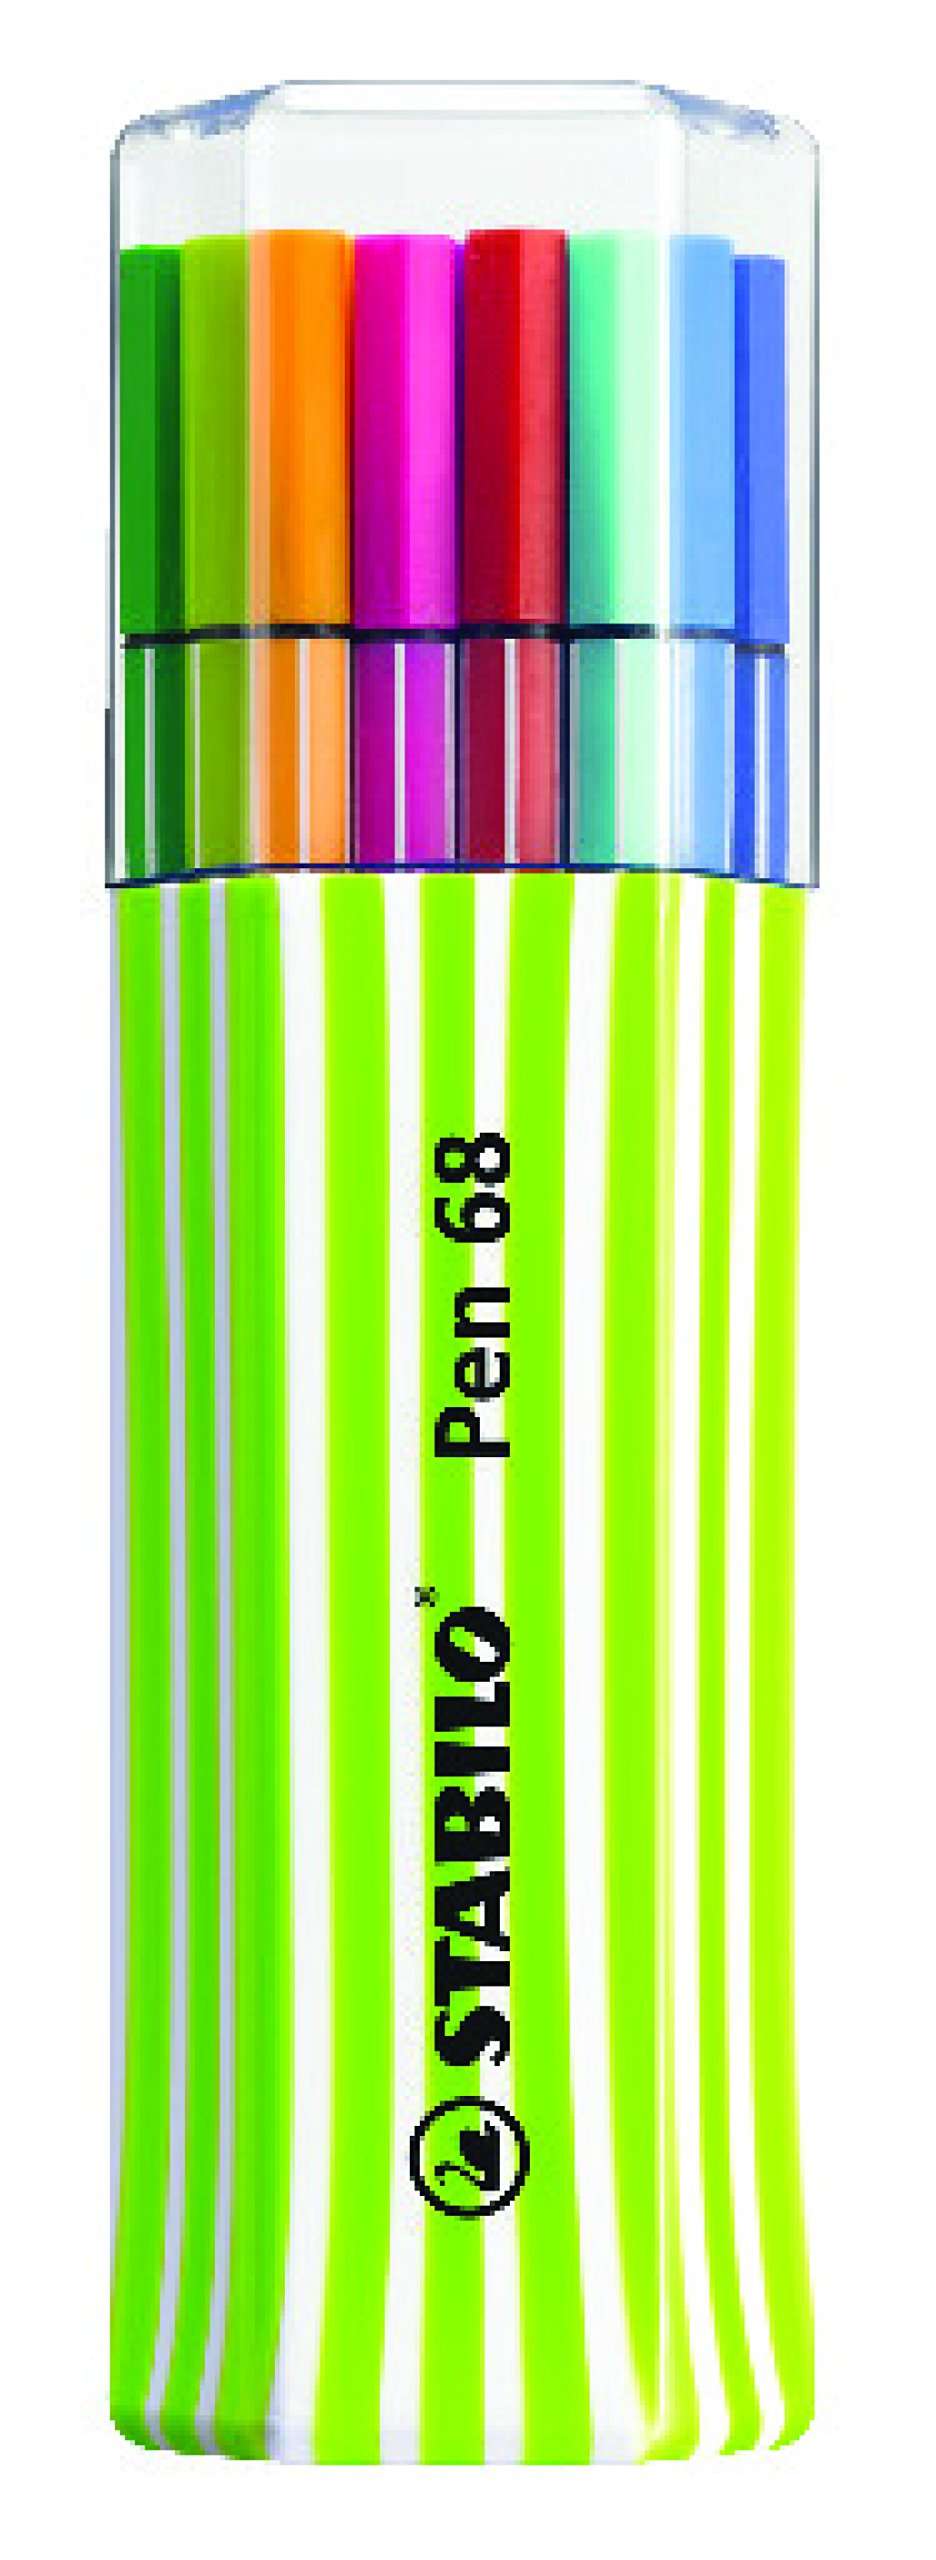 Stabilo Pen 68 6815-01-2-5 rotuladores, 15-él-pack único, verde